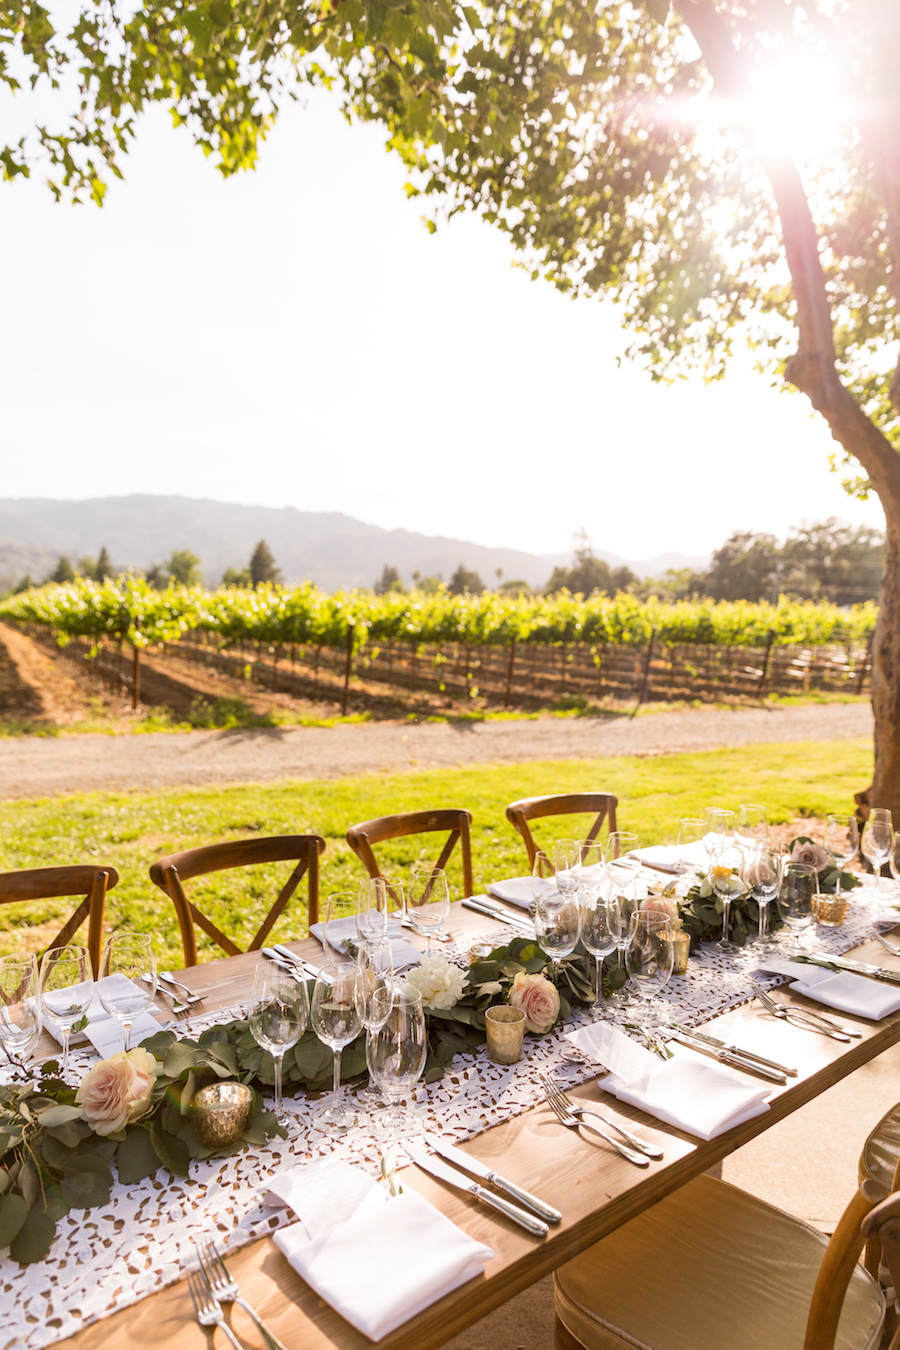 Chic and Organic Outdoor Wedding at Harvest Inn108.jpg